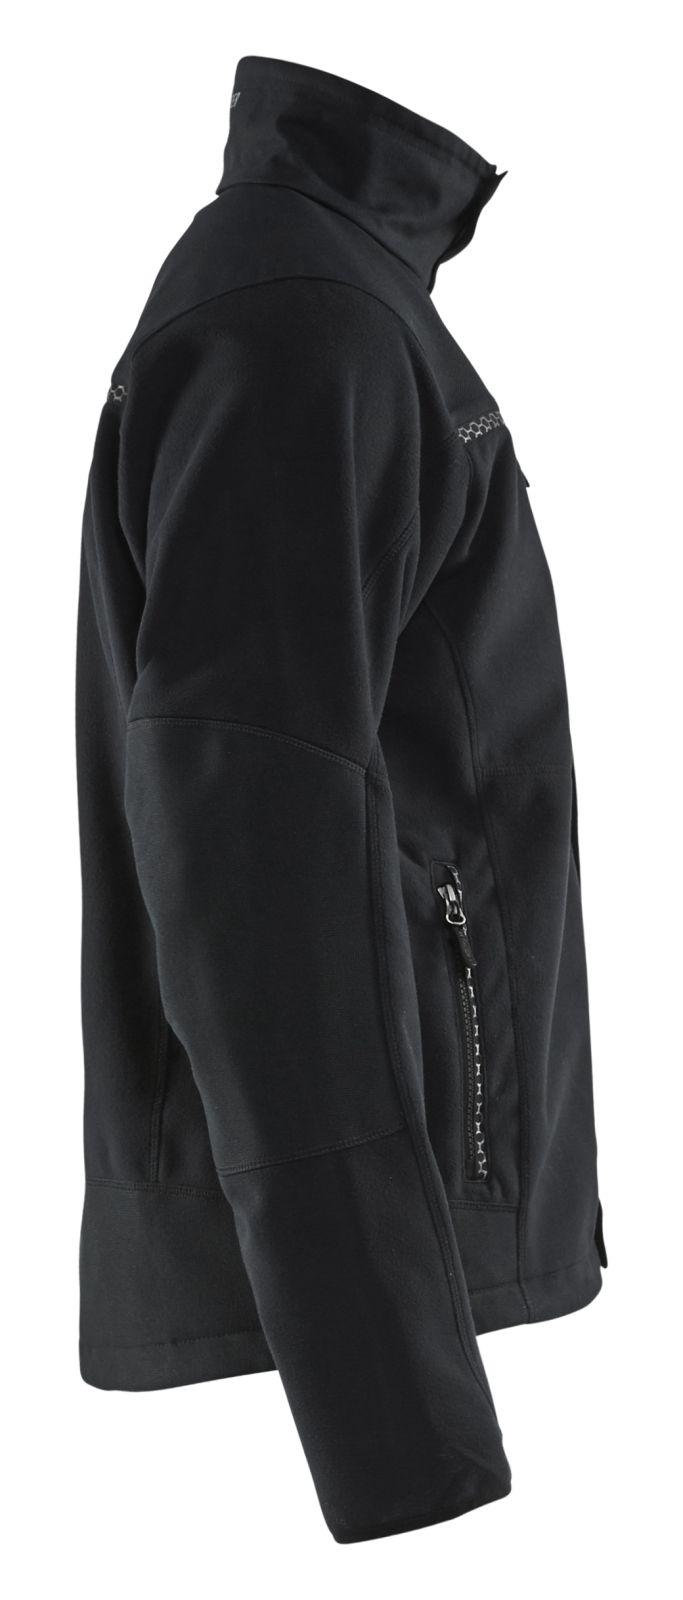 Blaklader Fleece jassen 49552524 zwart(9900)